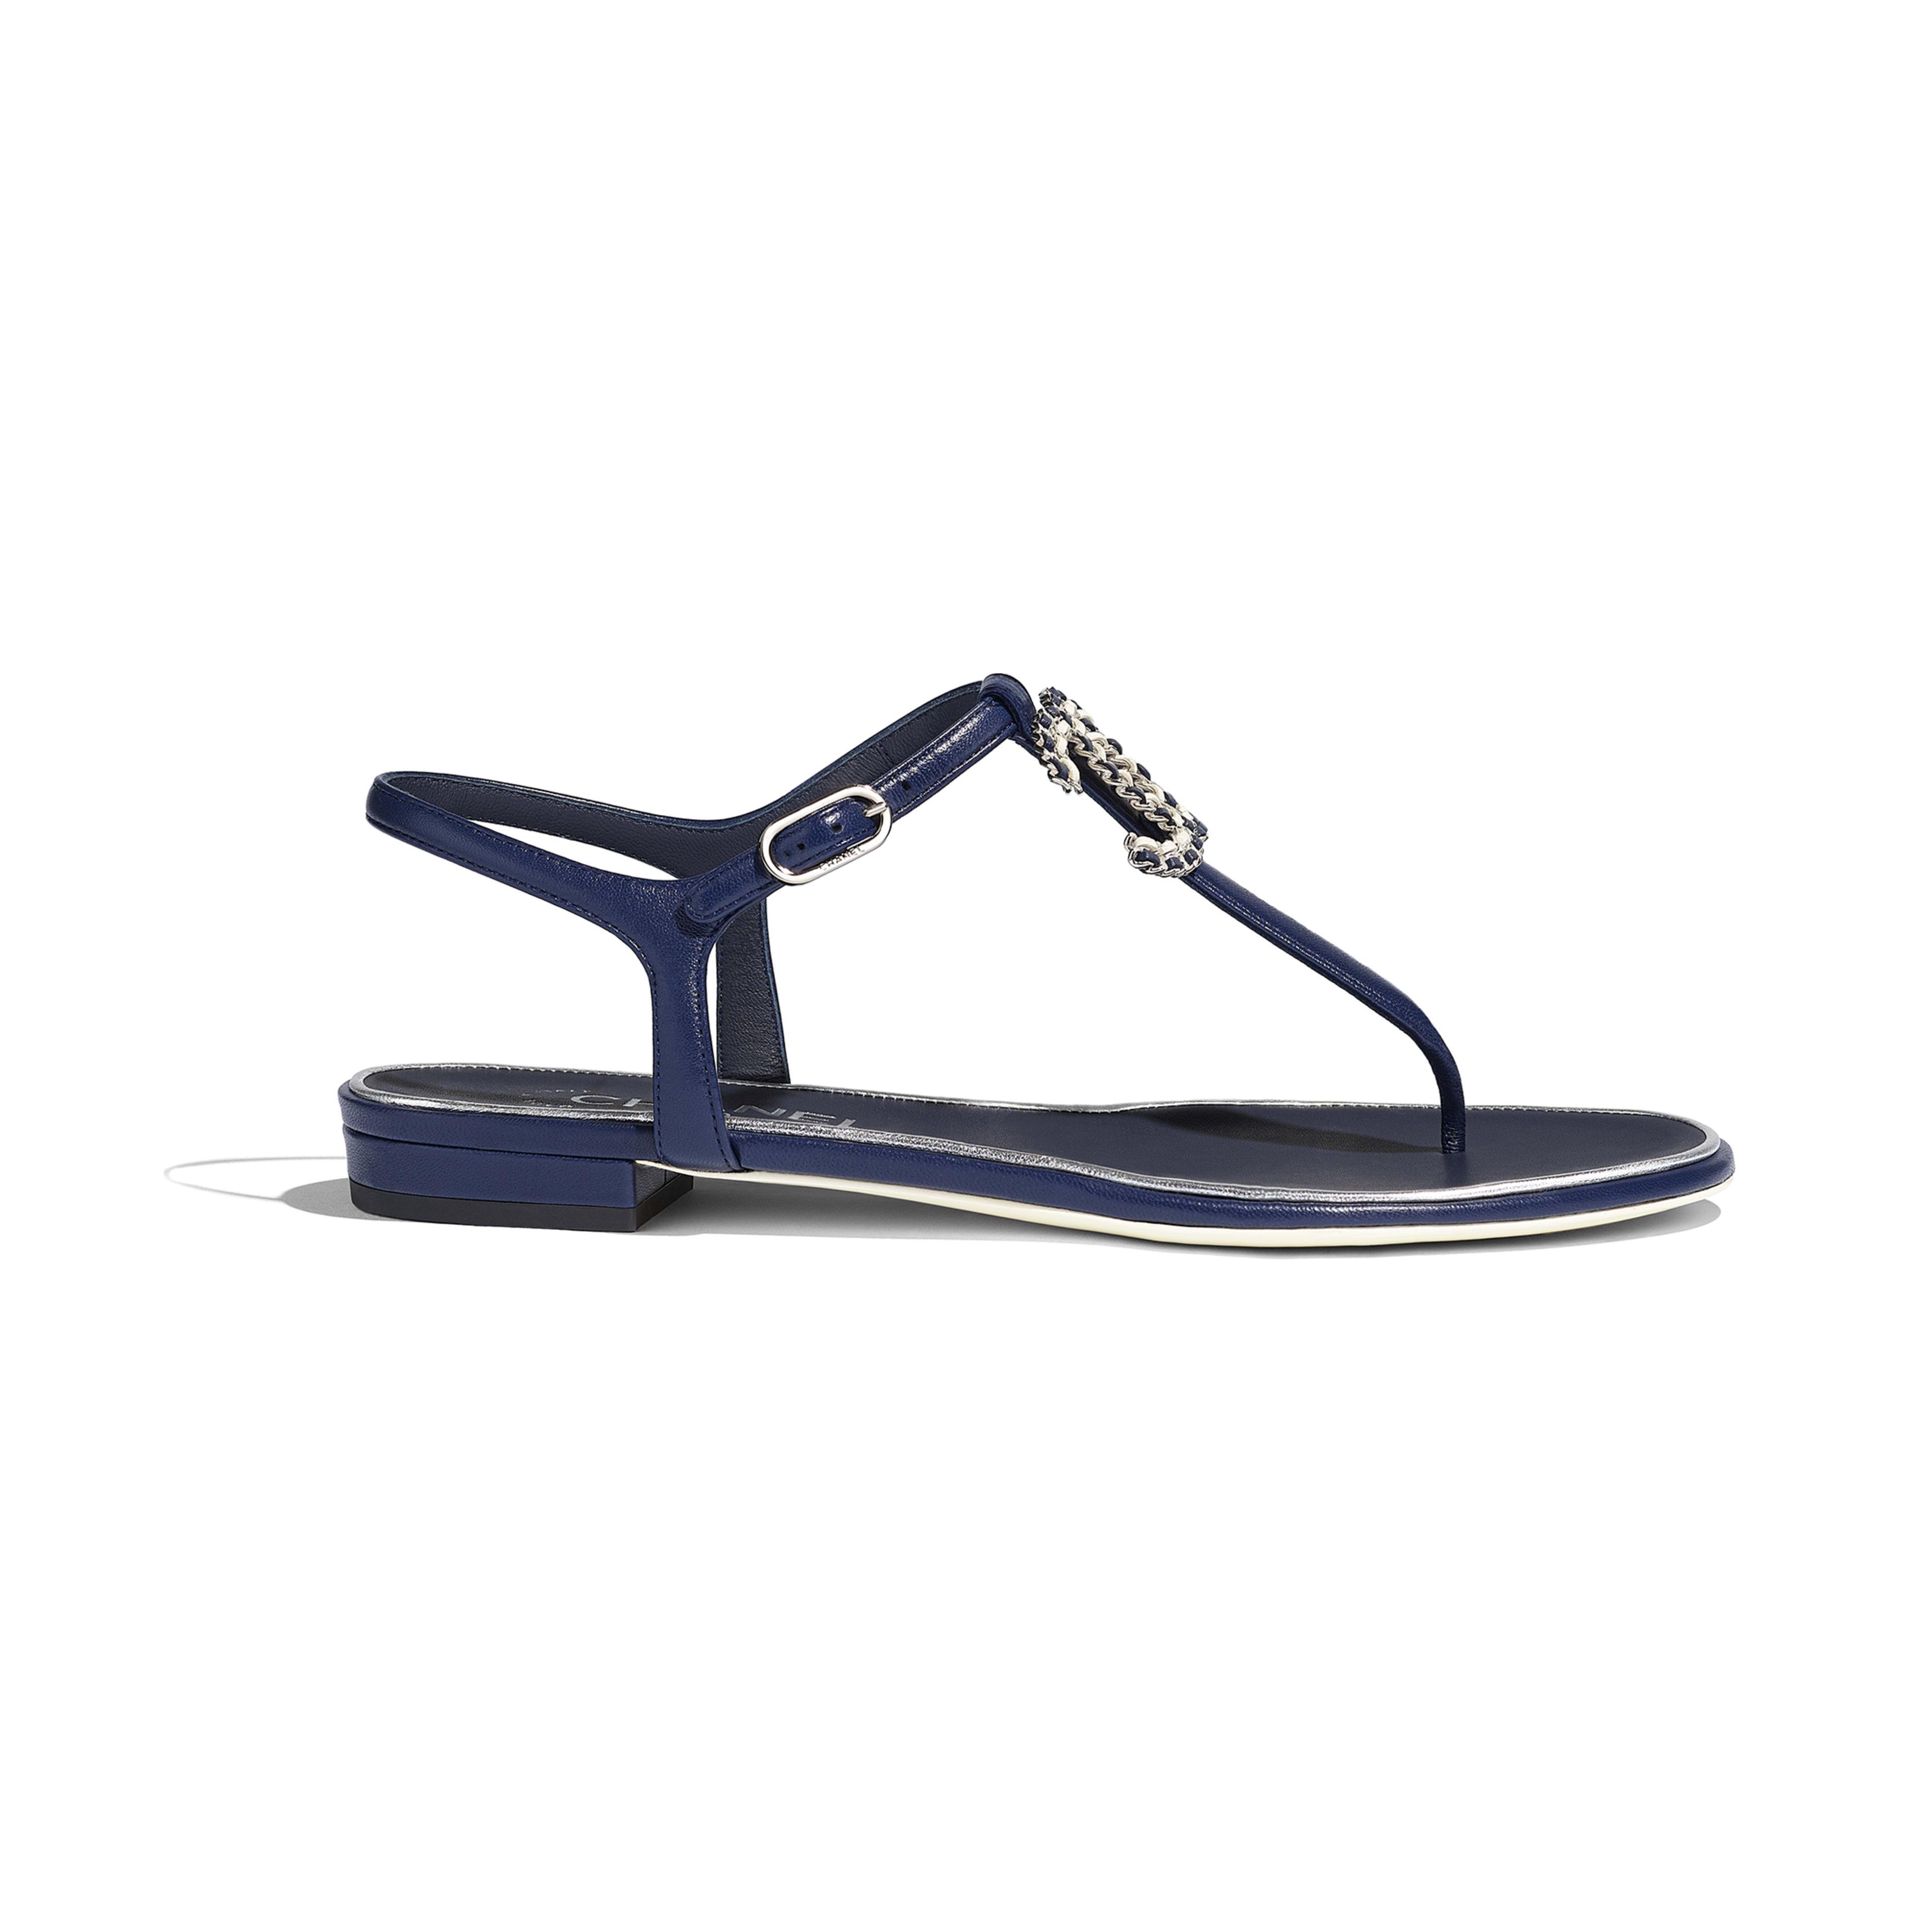 6cdf5211b3fdd2 Sandals navy blue lambskin default view see full sized version jpg  3840x3840 Blue sandals